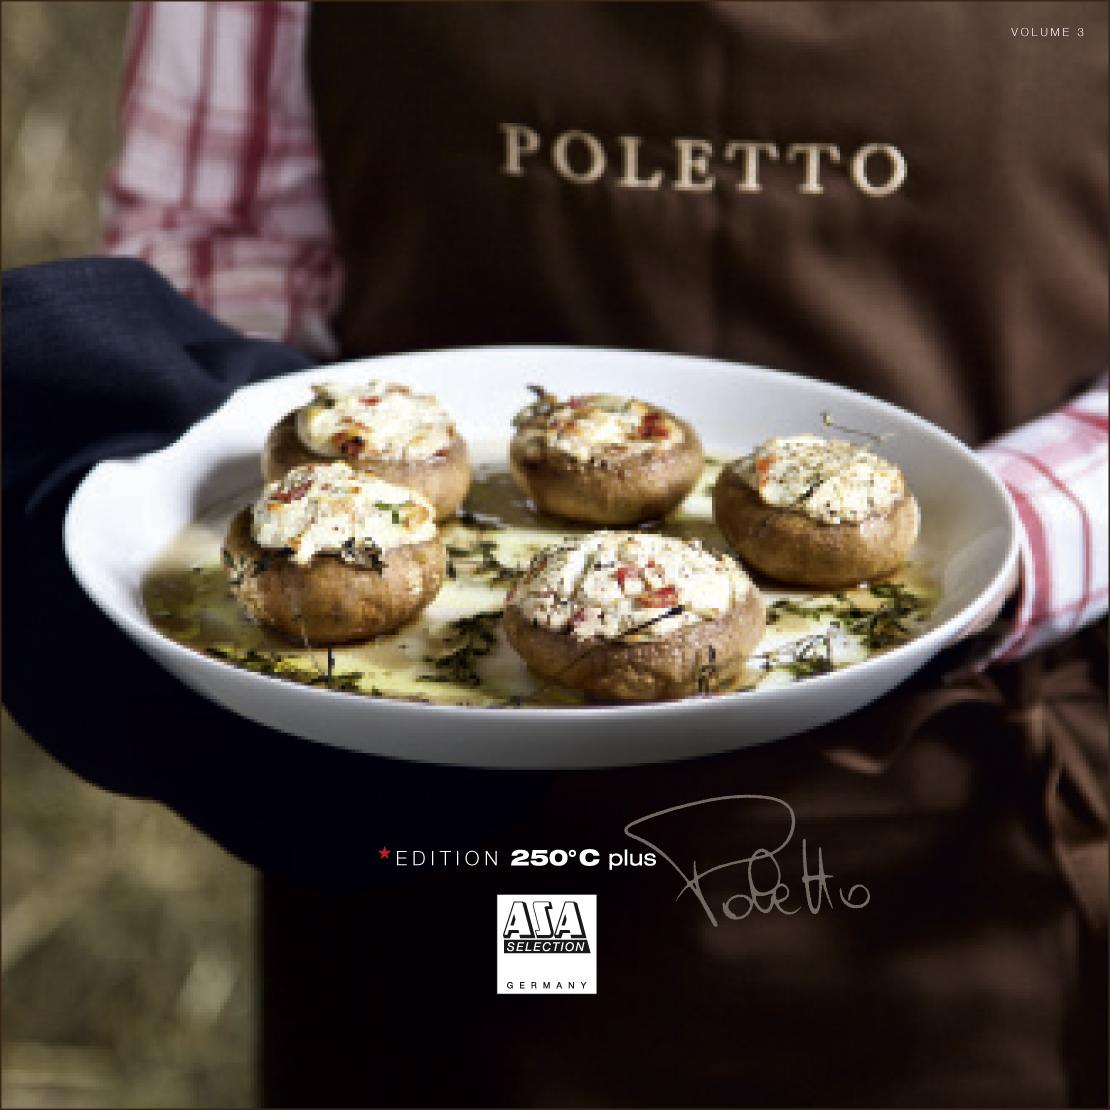 ASA_Poletto_11-1